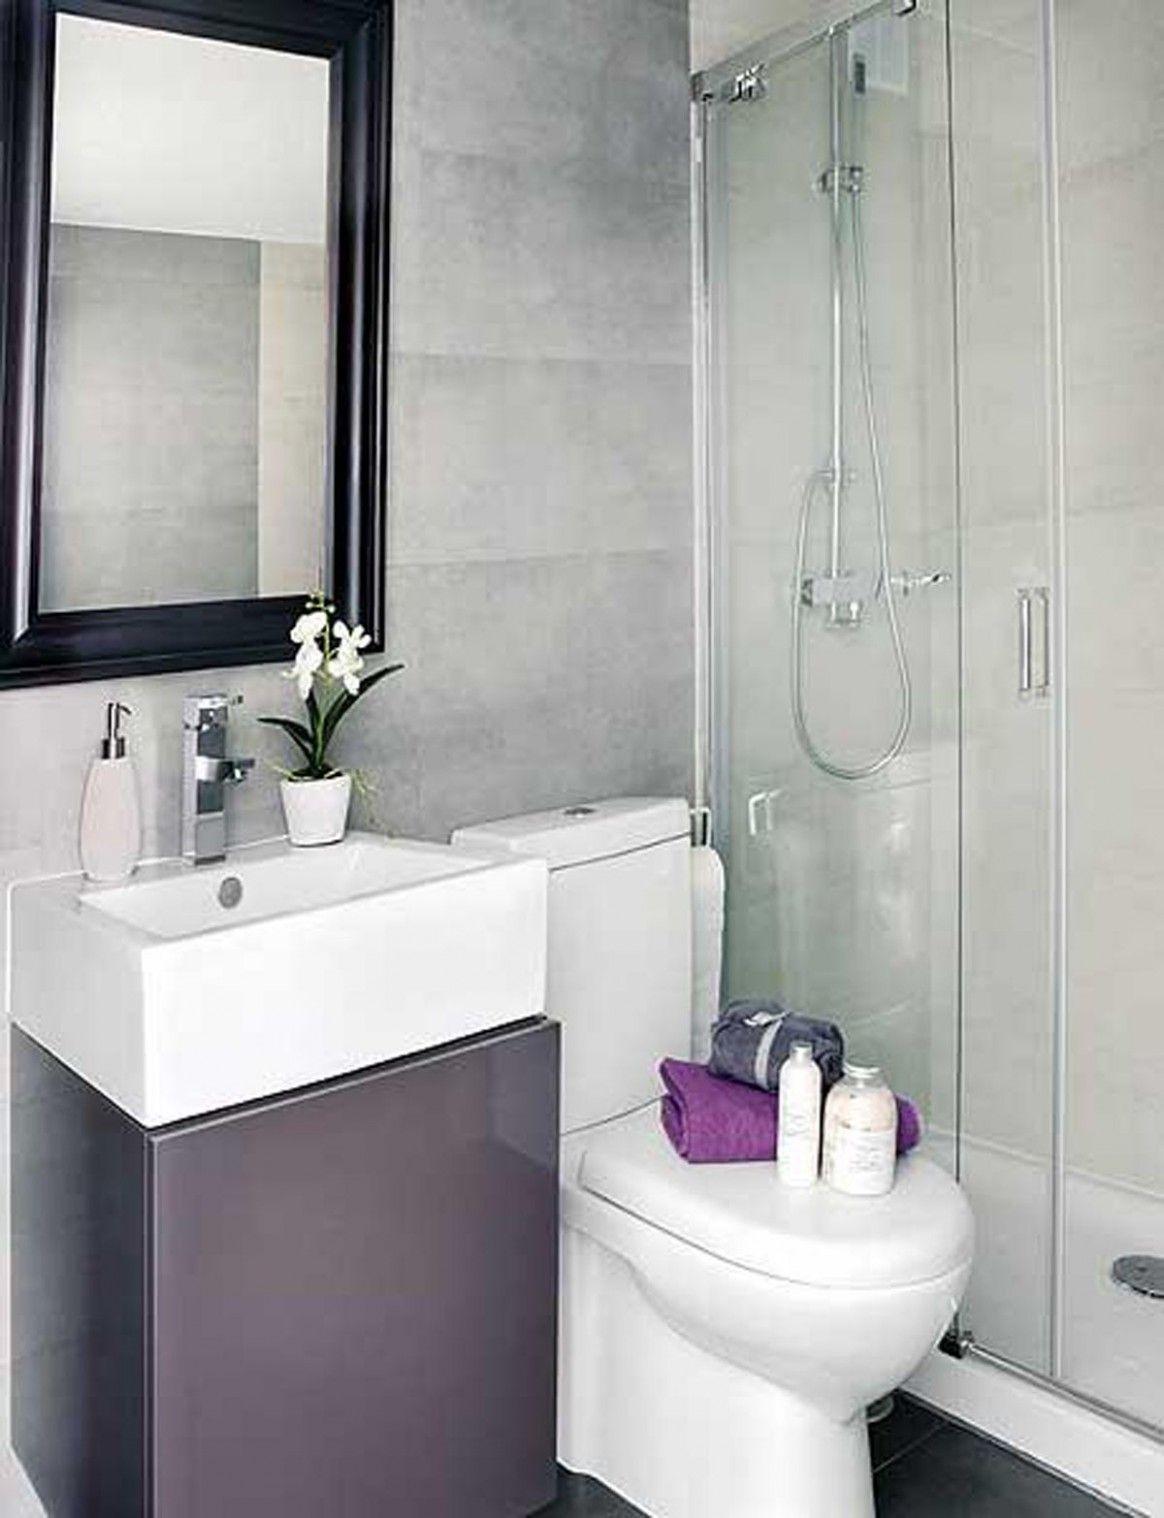 Bathroom Design For Small Space Philippines Bathroom Design For Small Space Philippines Bathroom Design For Small Space Philippines Here S What Di 2020 Modern Matras